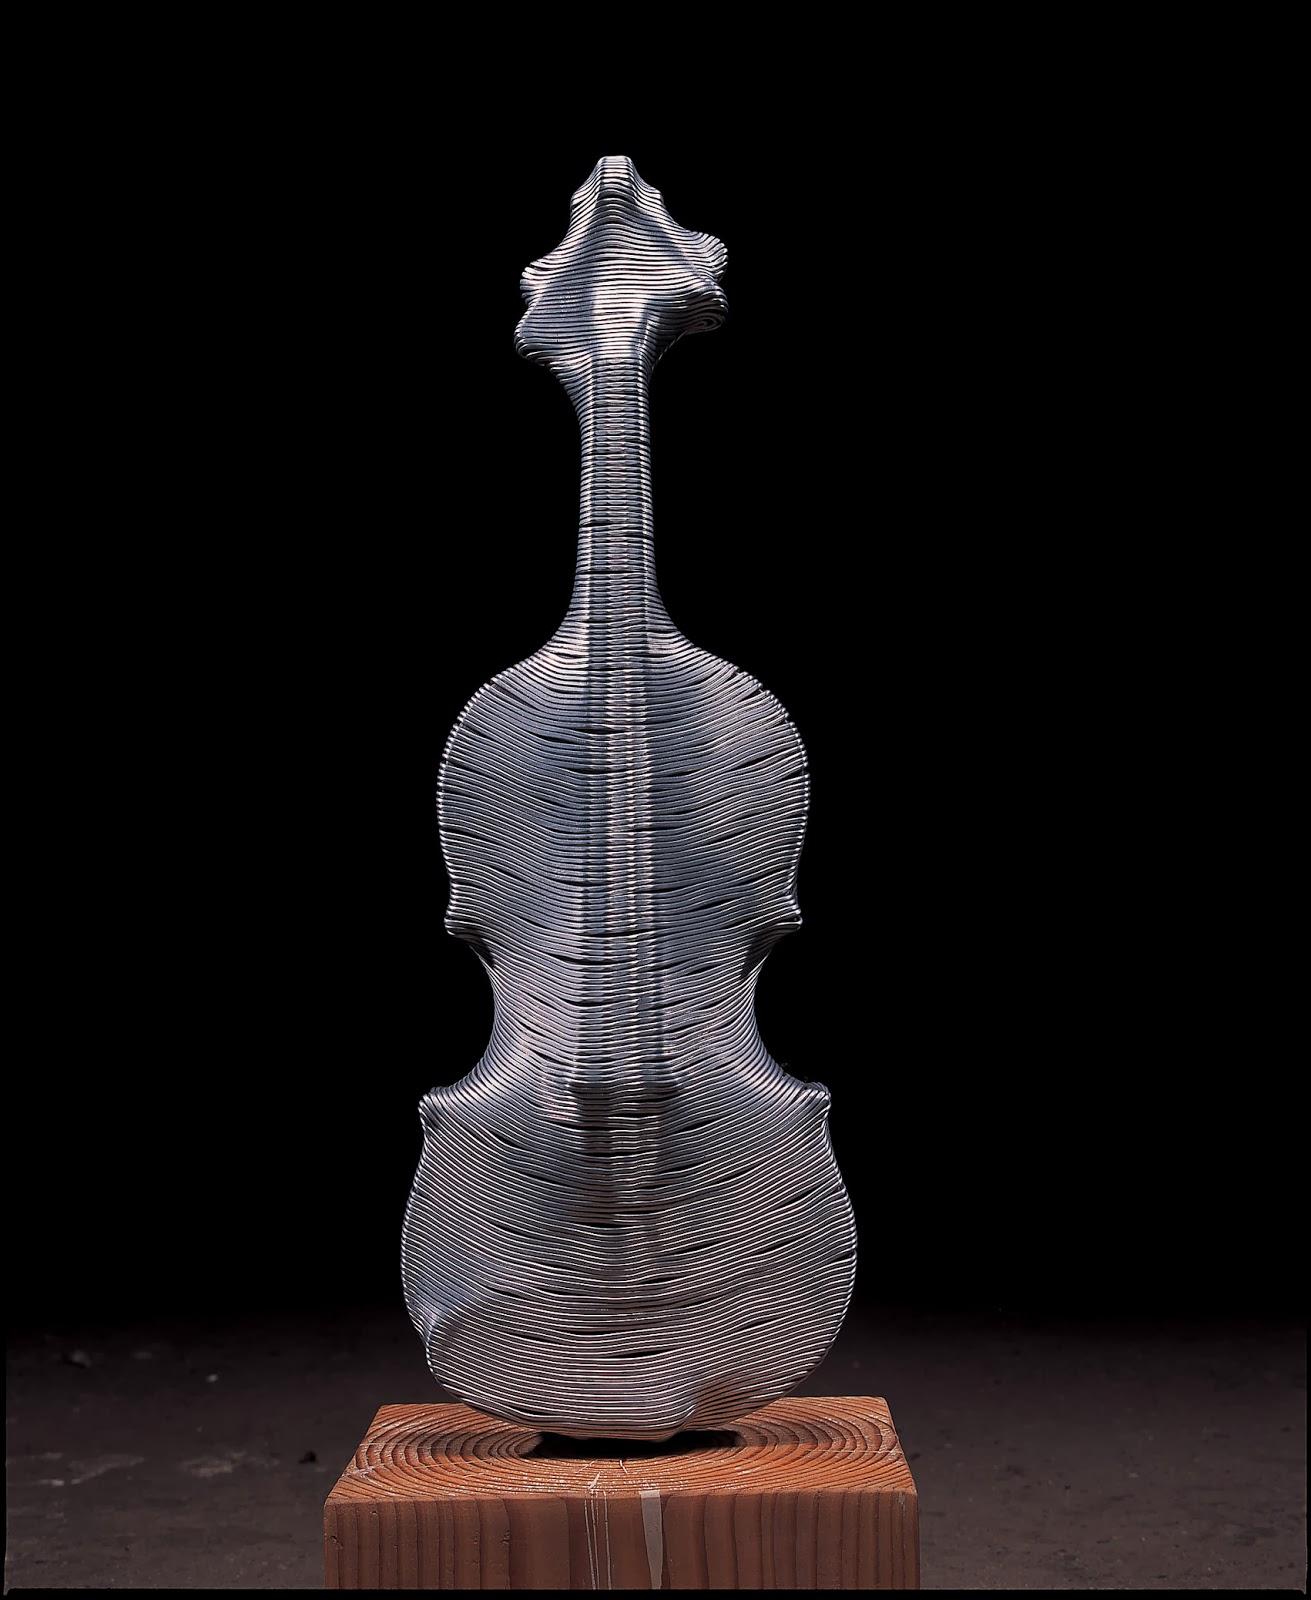 16-Violin-Park-Seung-Mo-South-Korean-Artist-&-Sculptor-Wire-Sculpture-www-designstack-co